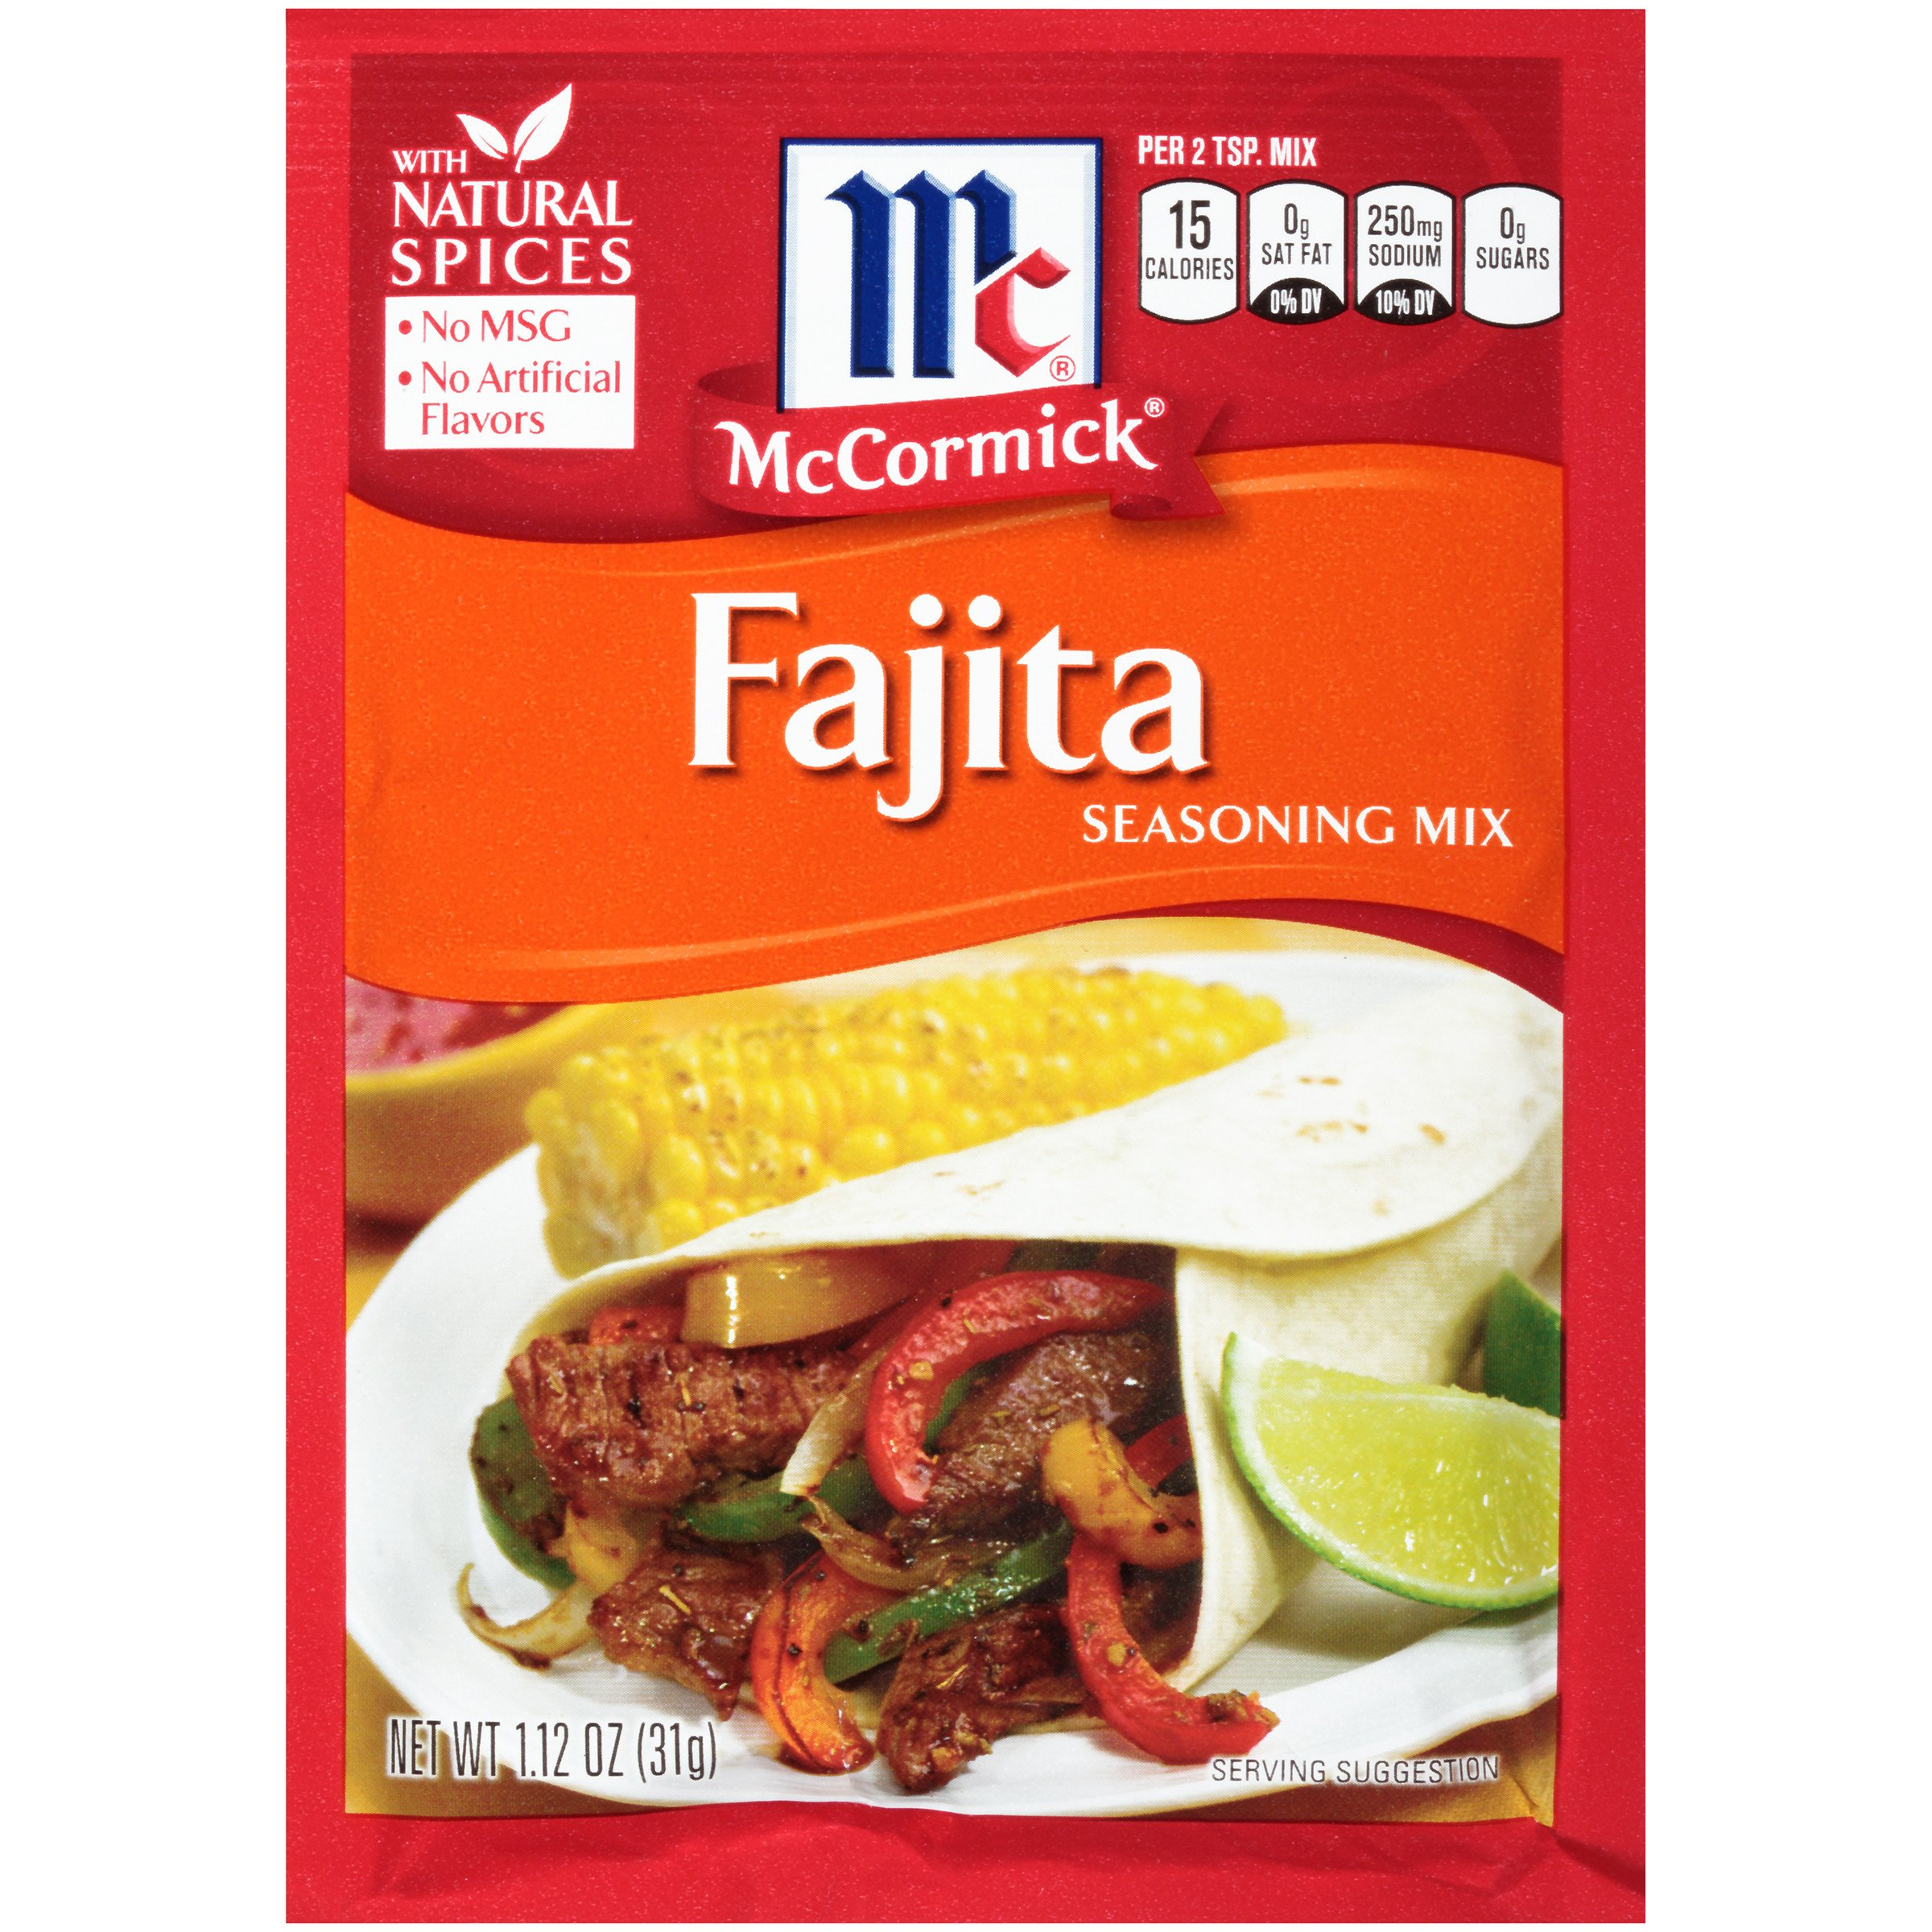 McCormick Fajitas Seasoning Mix, 1.12 OZ by McCormick (Image #1)